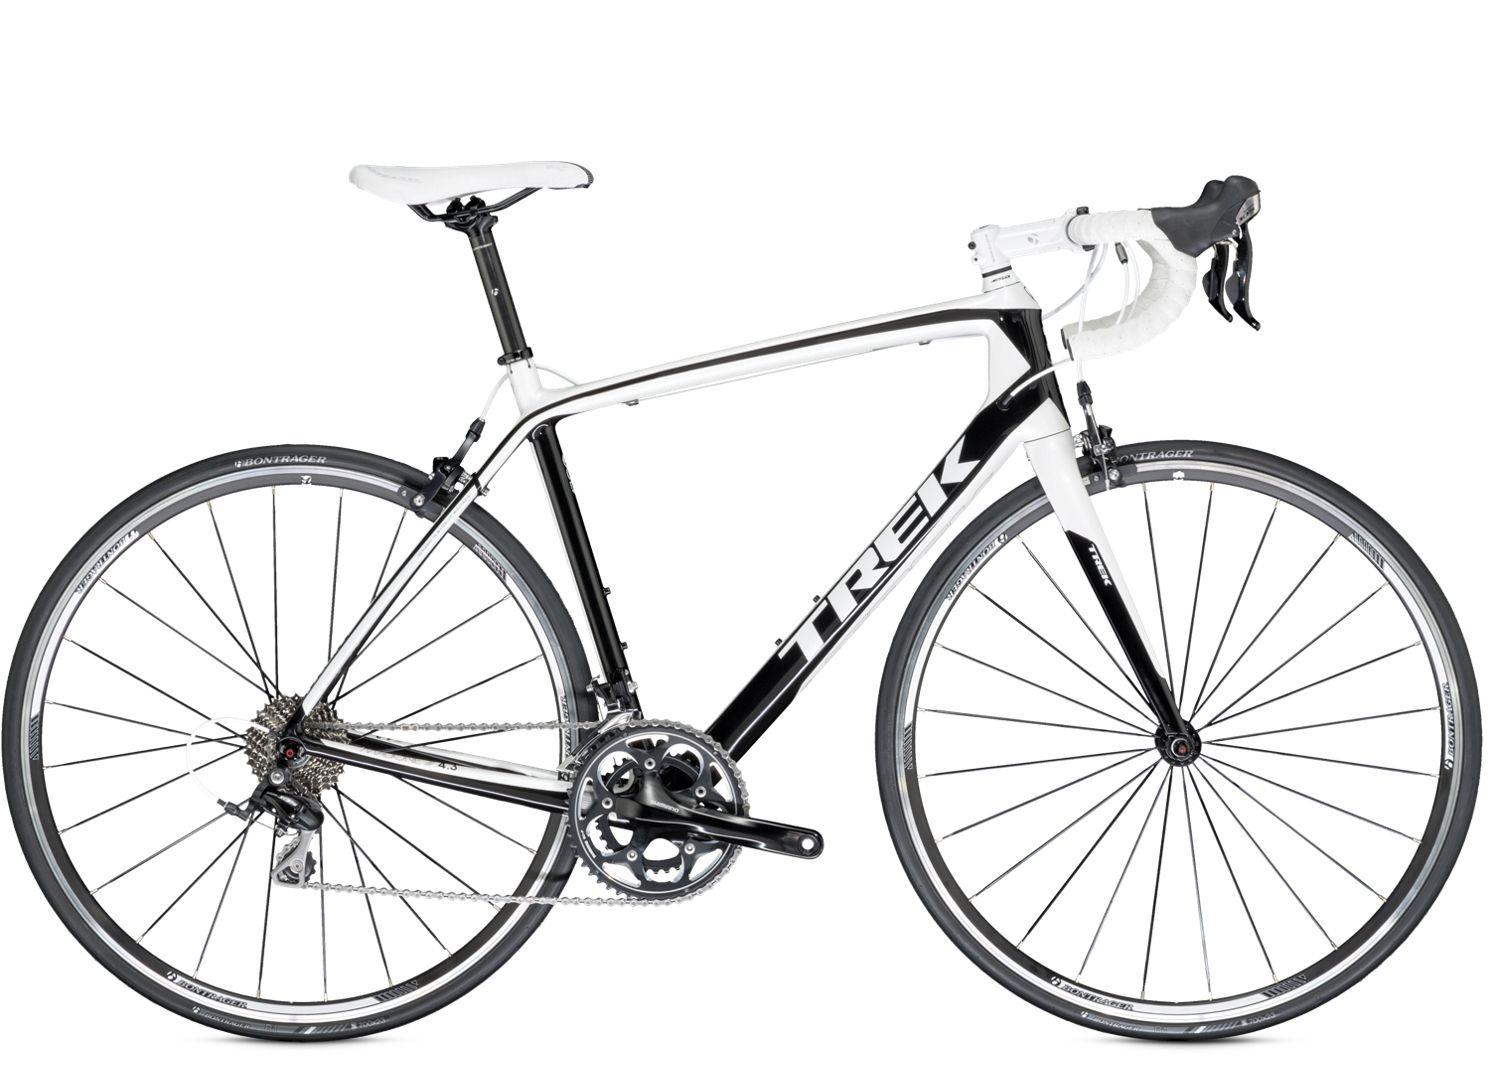 Madone 4 3 Trek Bicycle Affordable Bikes Road Bikes